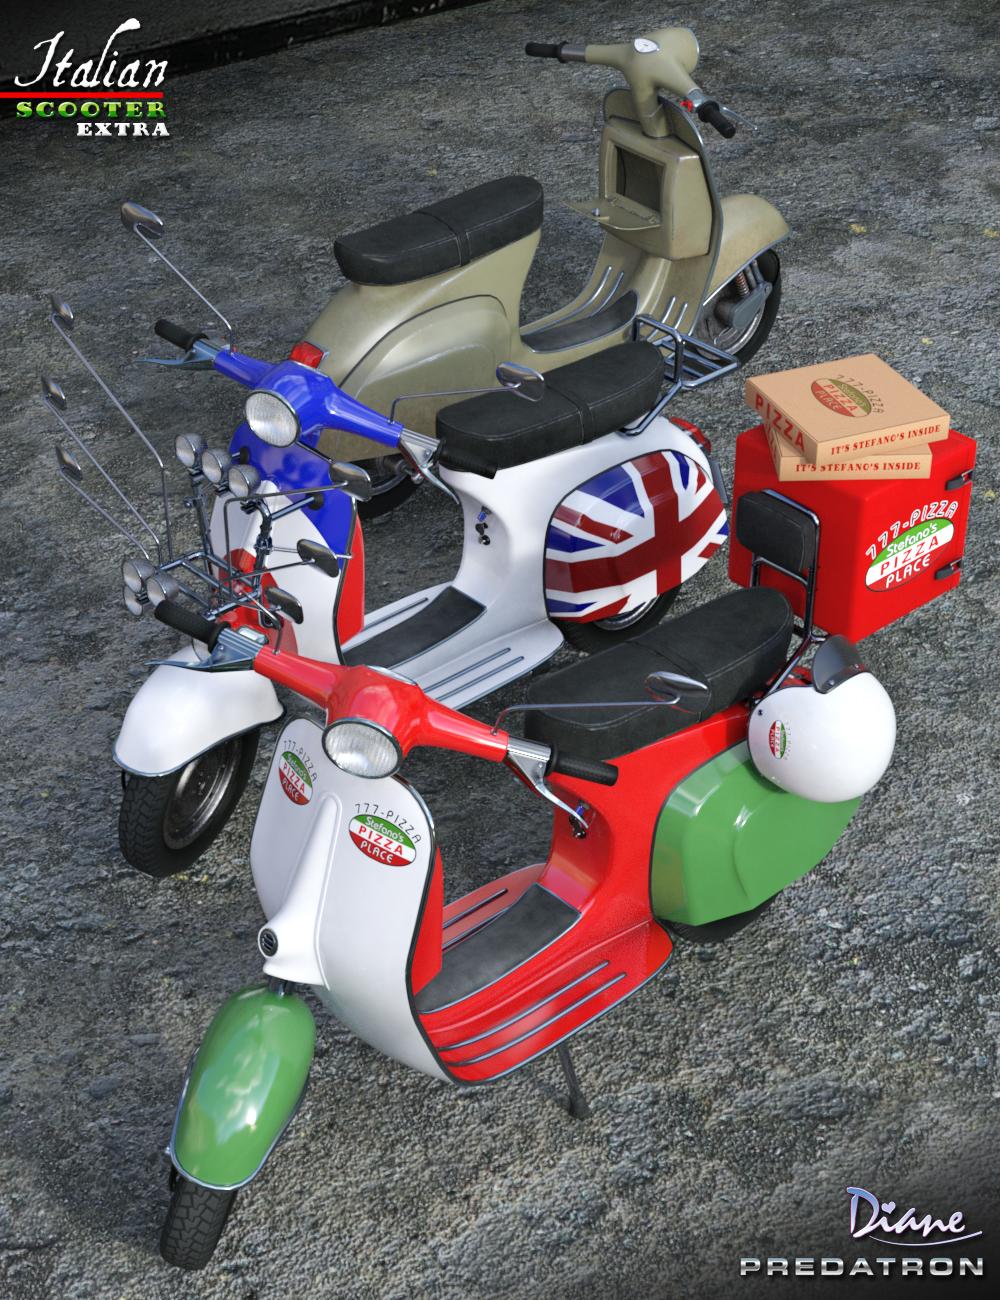 Italian Scooter Extras by: PredatronDiane, 3D Models by Daz 3D